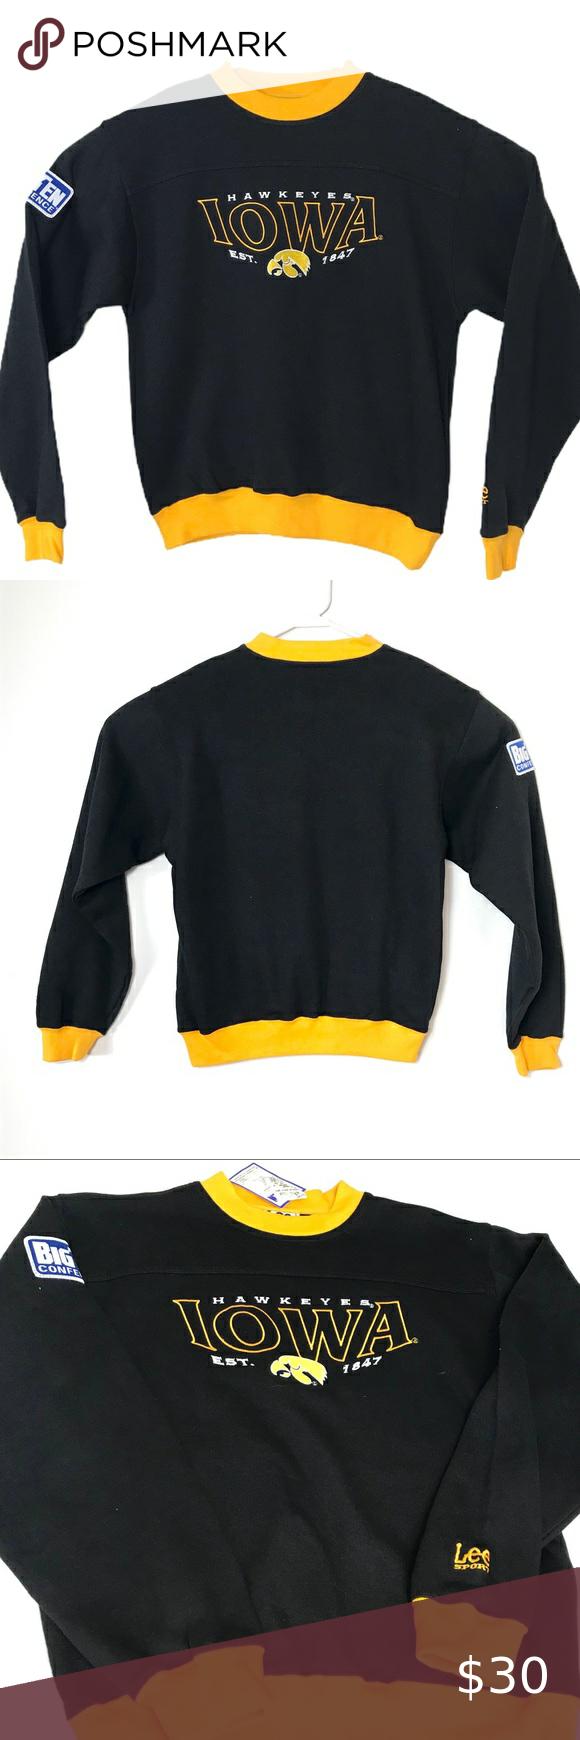 Vtg Iowa Hawkeyes Sweatshirt Lee Sport Nwt Sz L Vintage Nwt Iowa Hawkeyes Sweatshirt Size Large Lee Sport Black An Sweatshirts Iowa Hawkeyes Sweatshirt Shirt [ 1740 x 580 Pixel ]